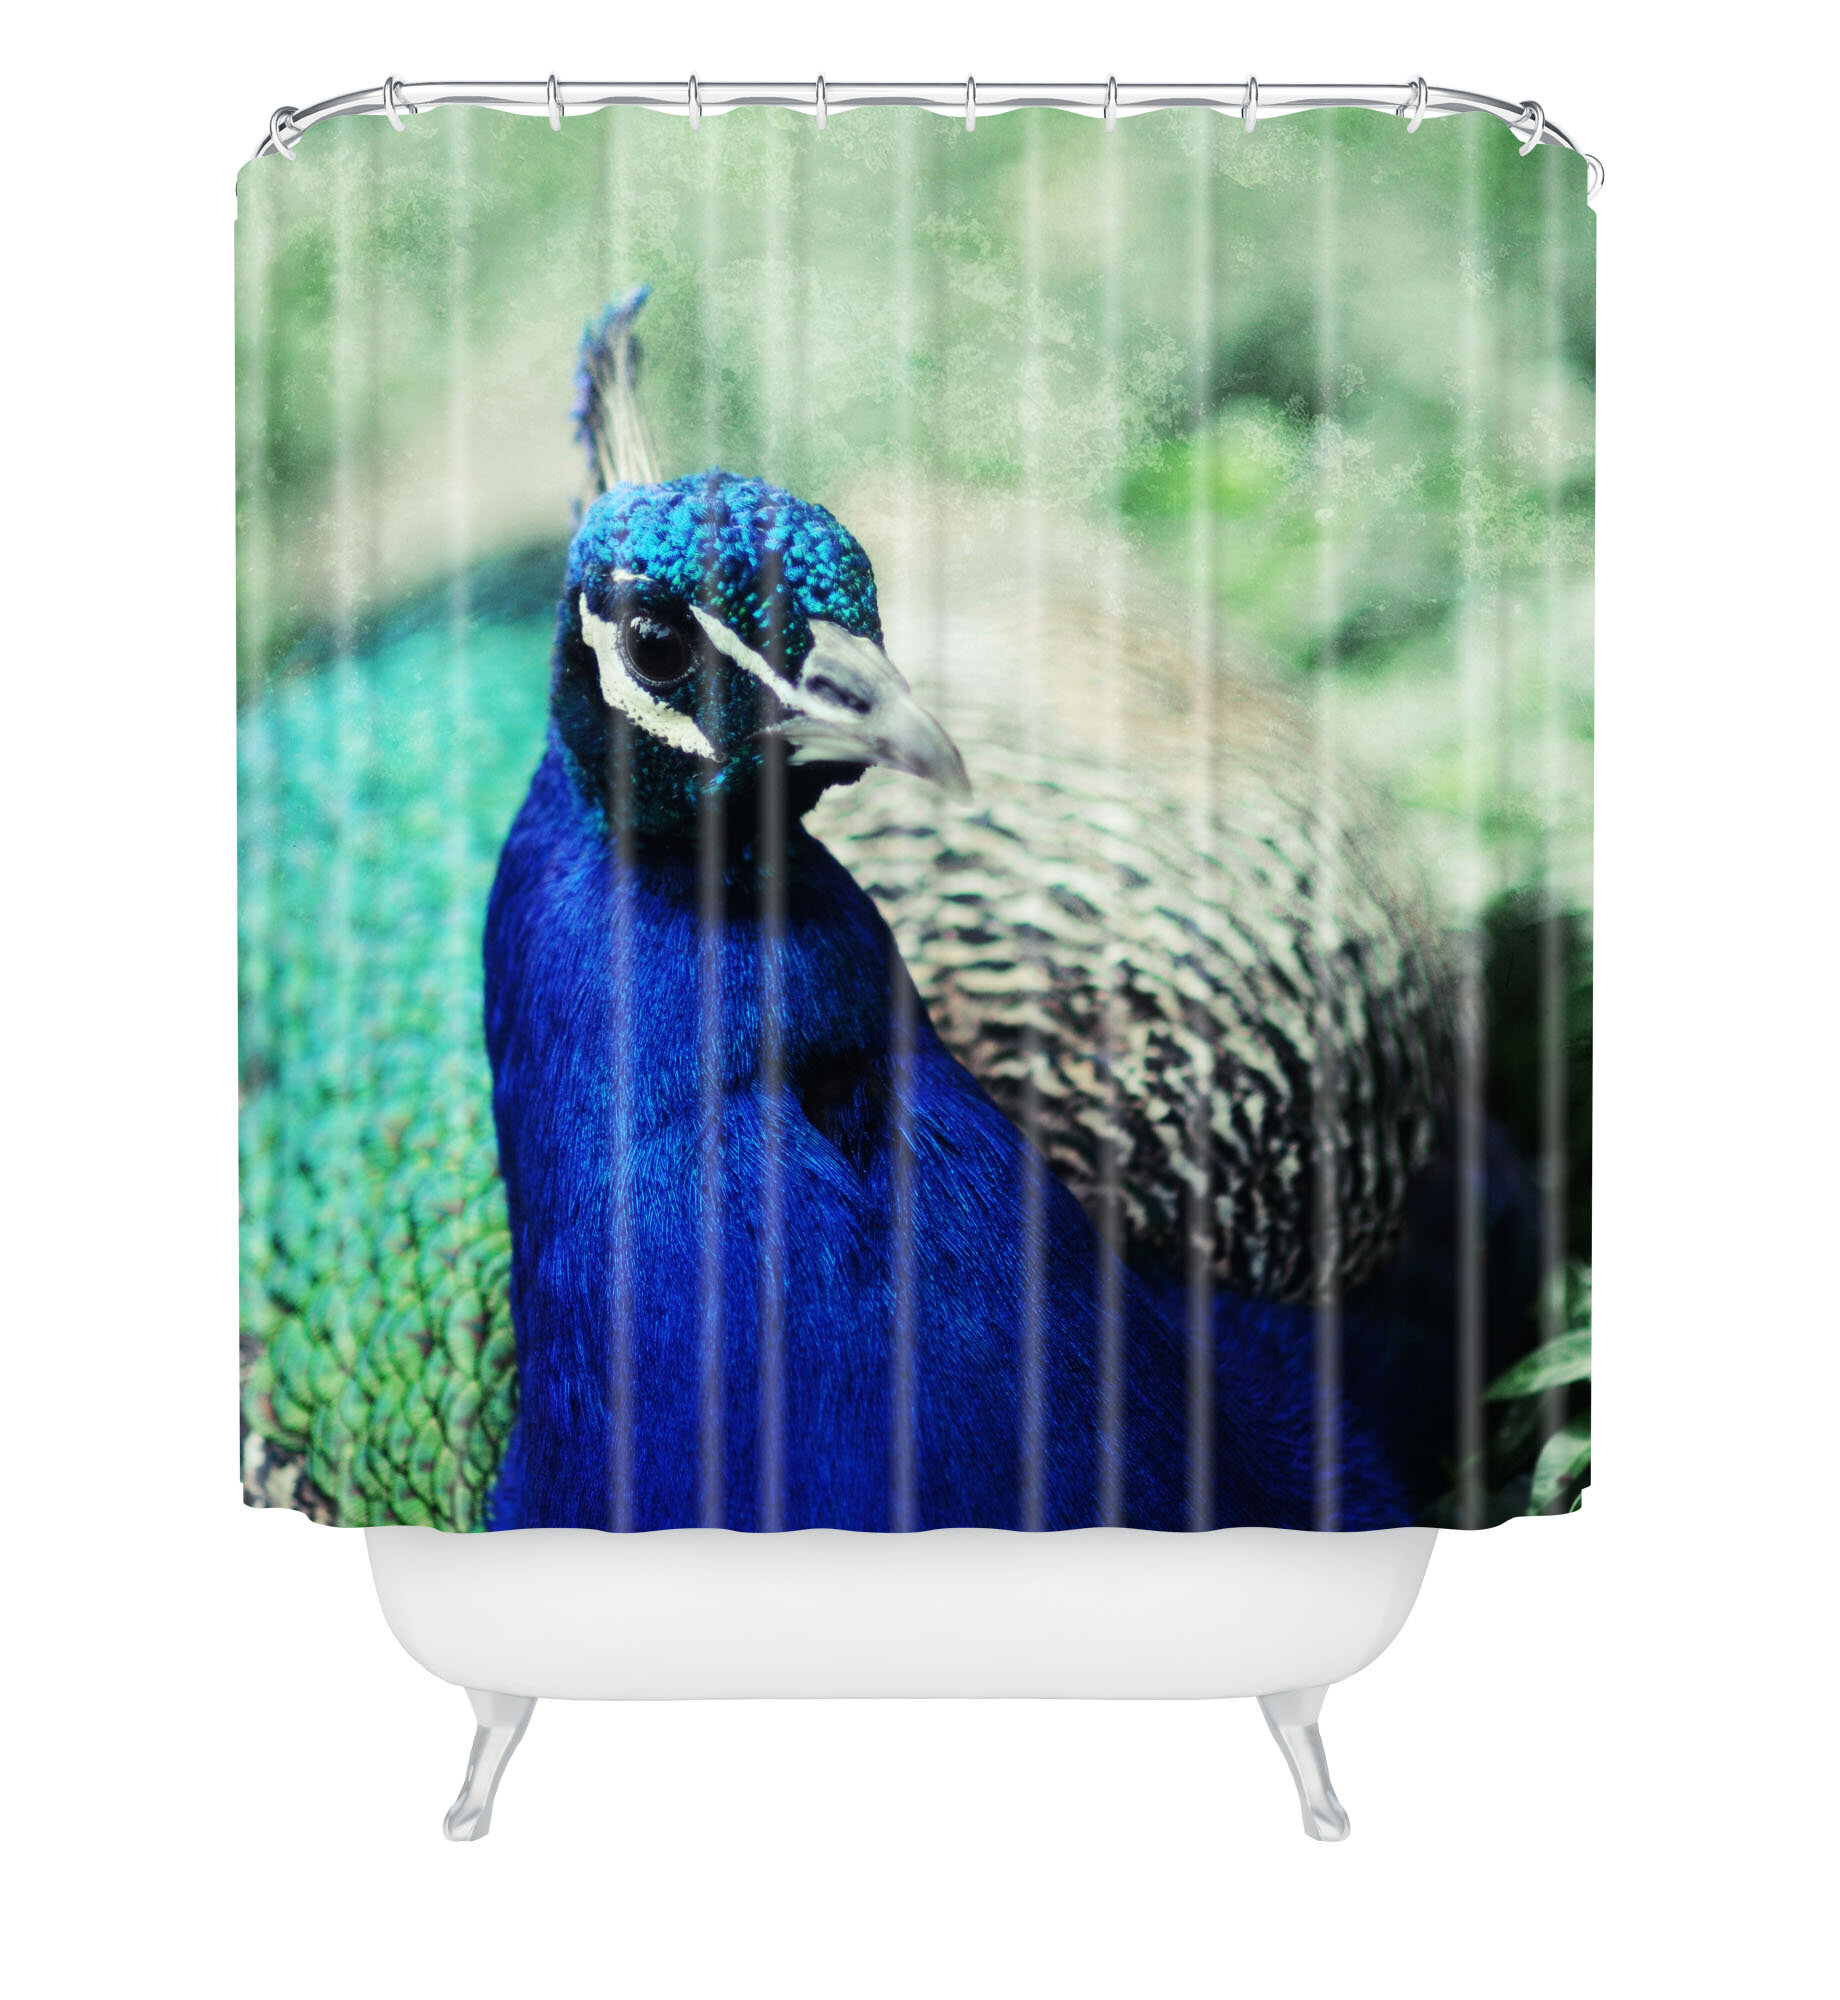 Green Peafowl Waterproof Bathroom Polyester Shower Curtain Liner Water Resistant